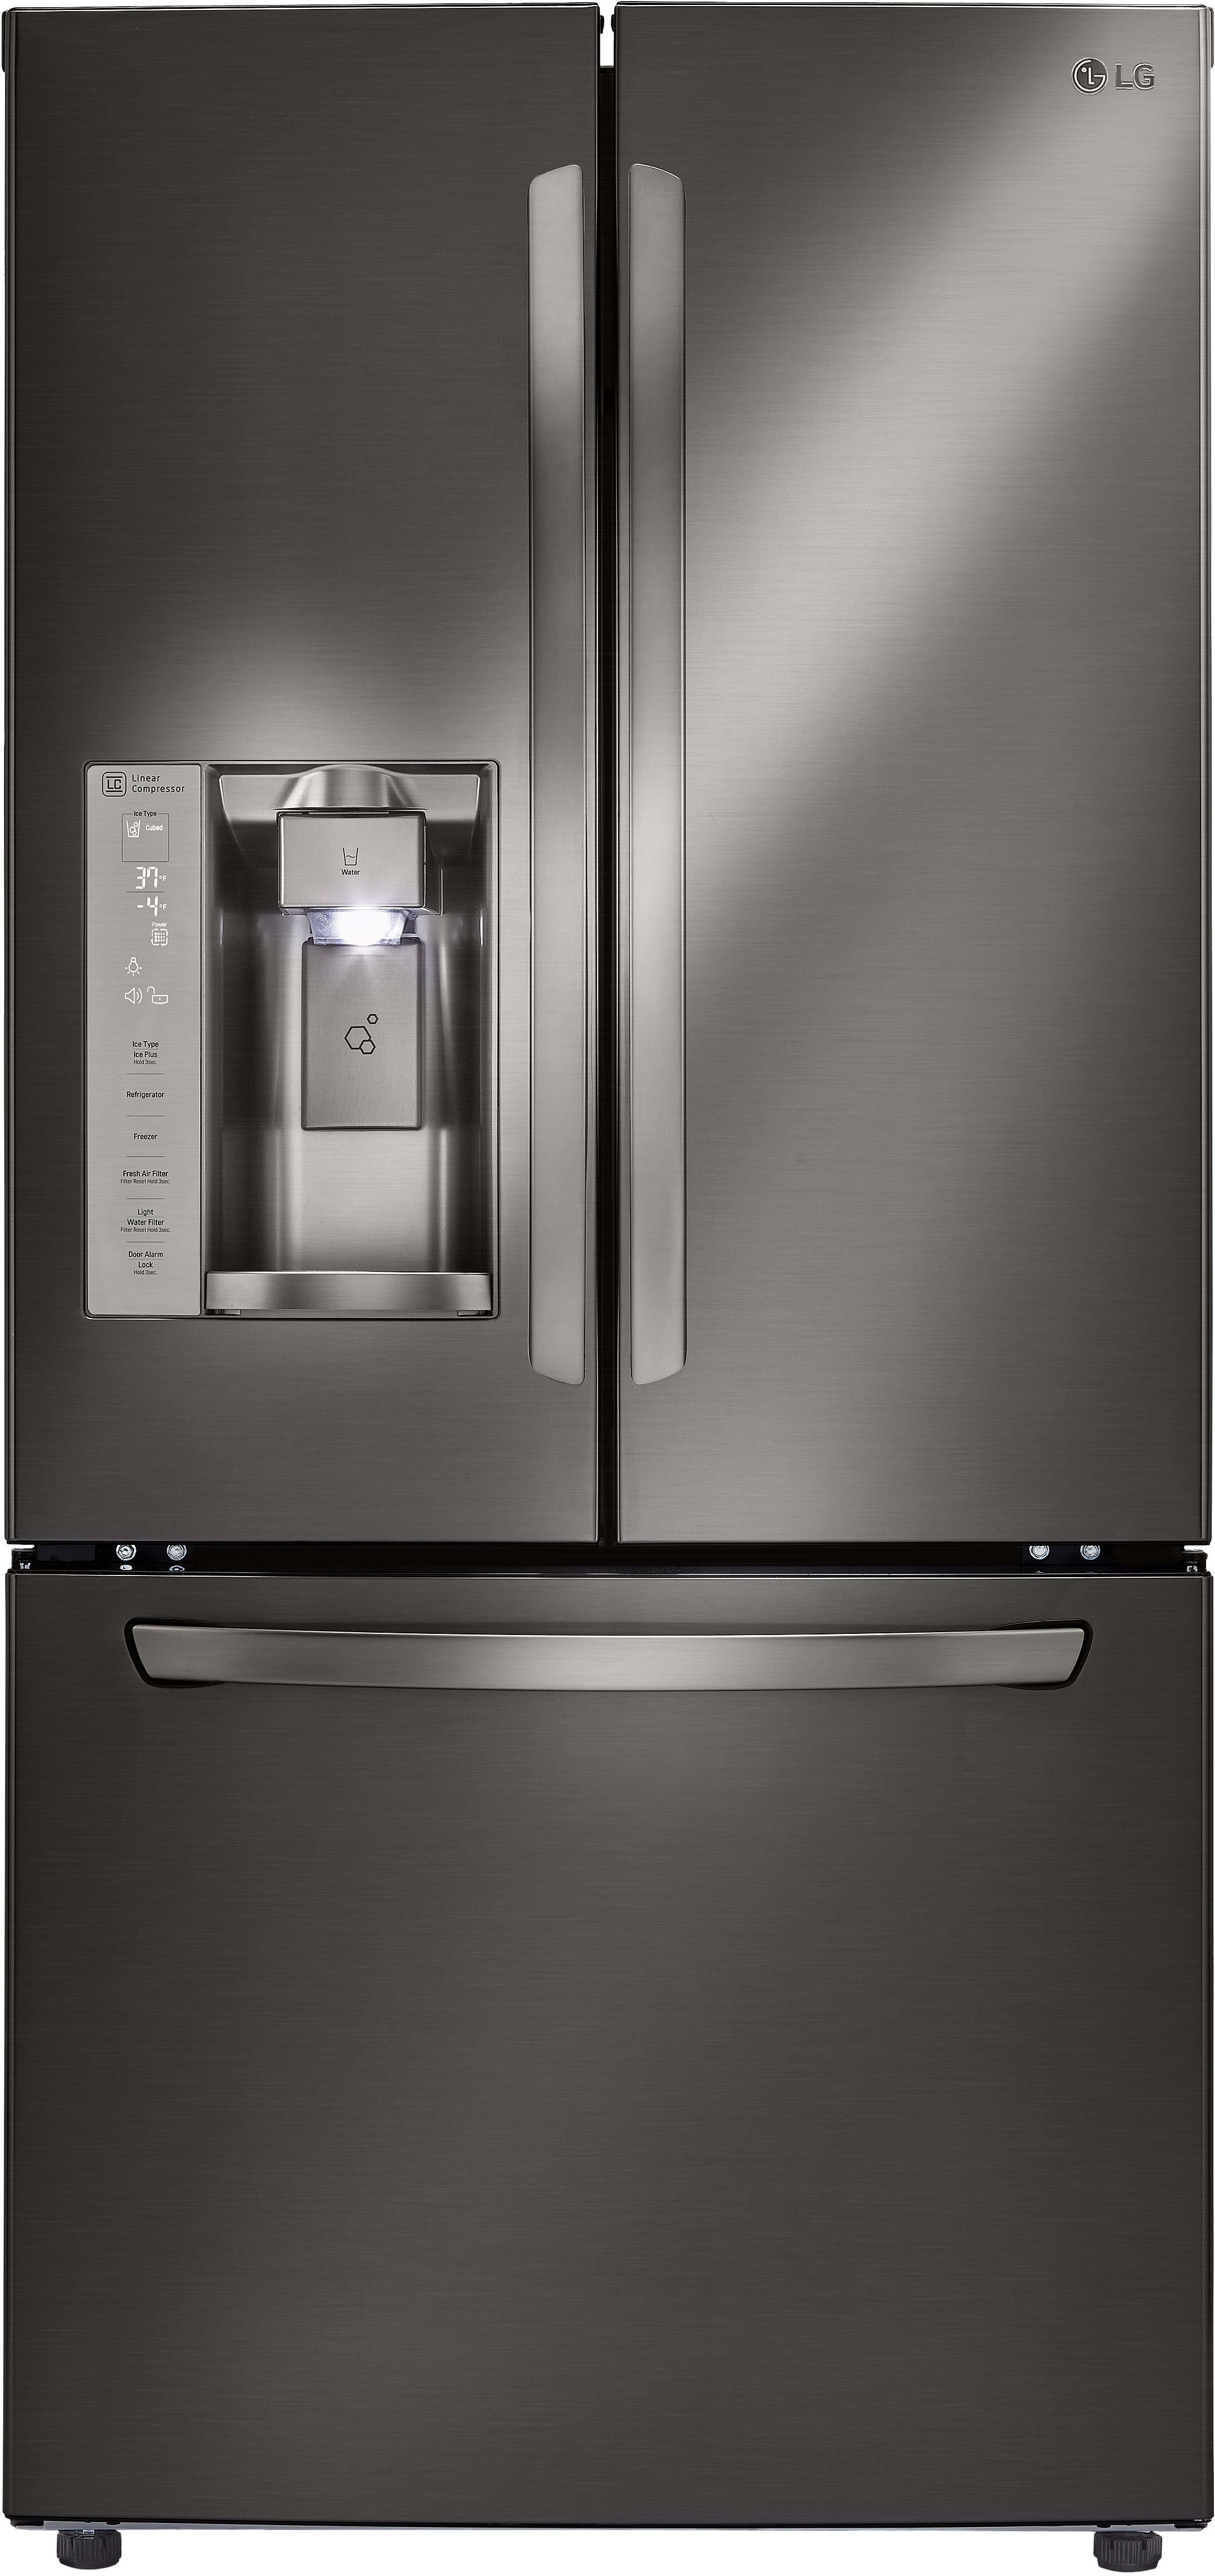 Lg Lfxs24623d 33 Inch French Door Refrigerator With Slim